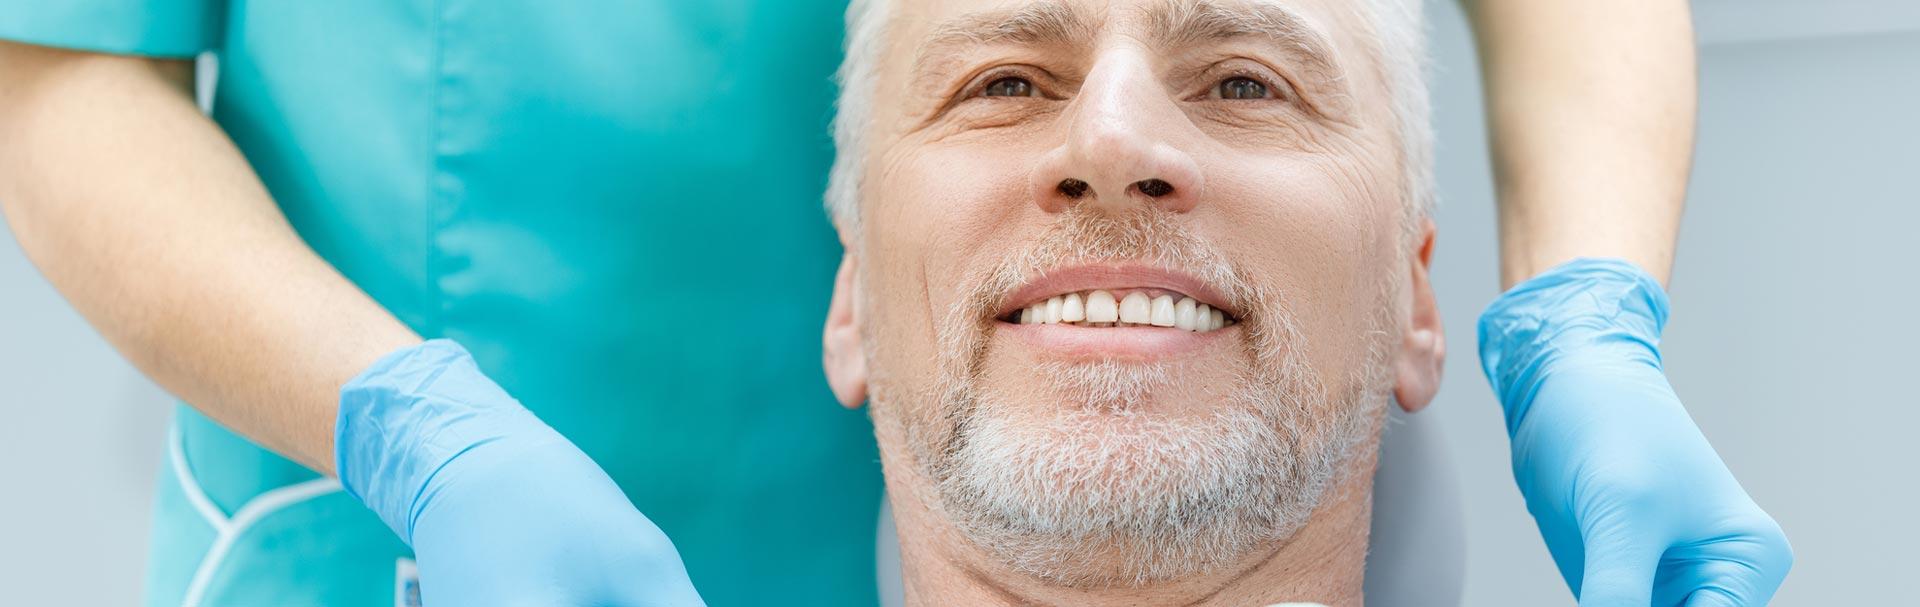 Man ready for ceramic Implants treatment